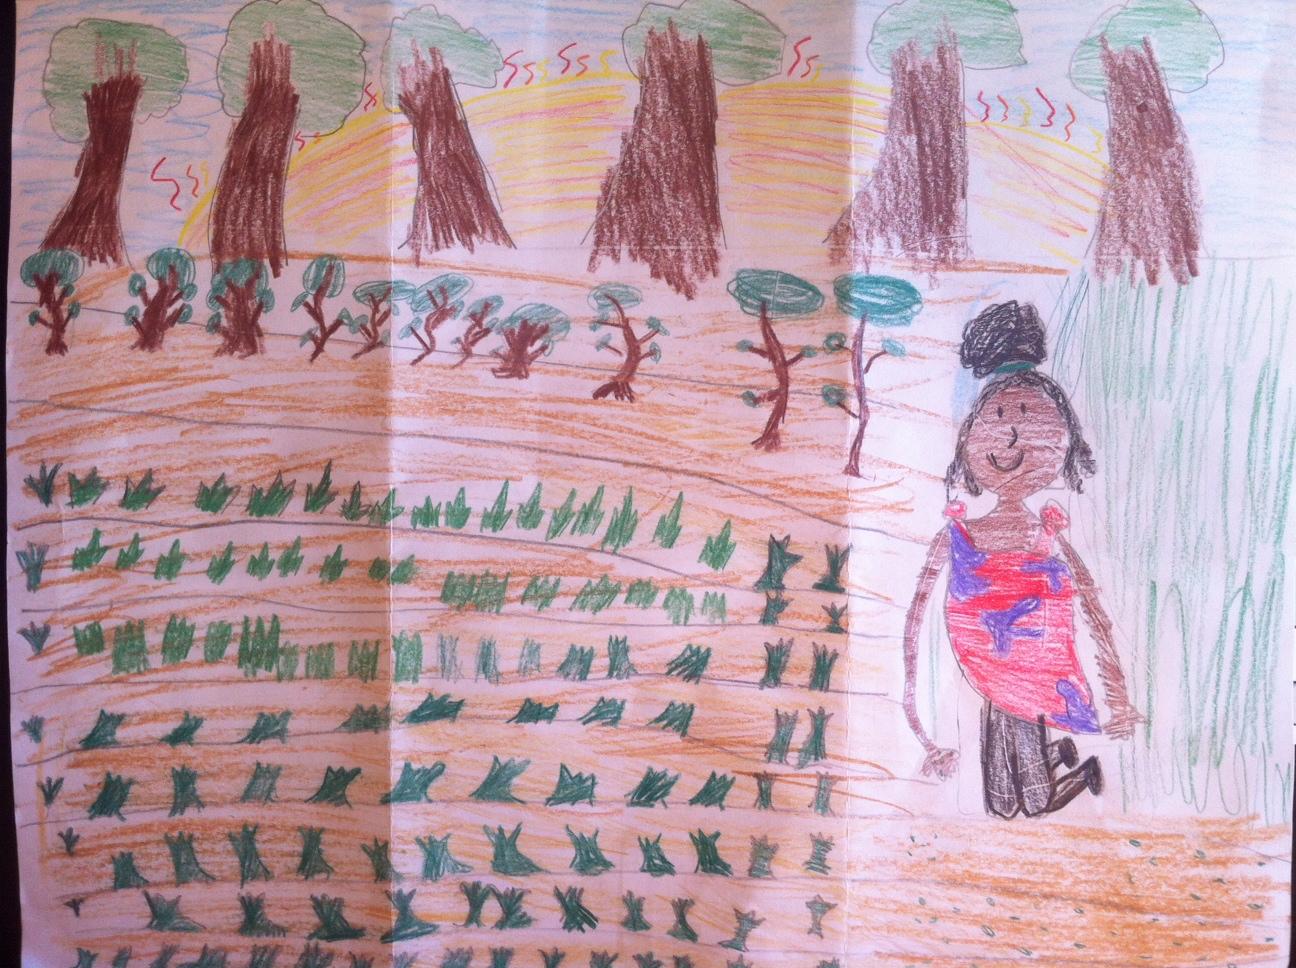 John Lyman Elementary School Student Drawing